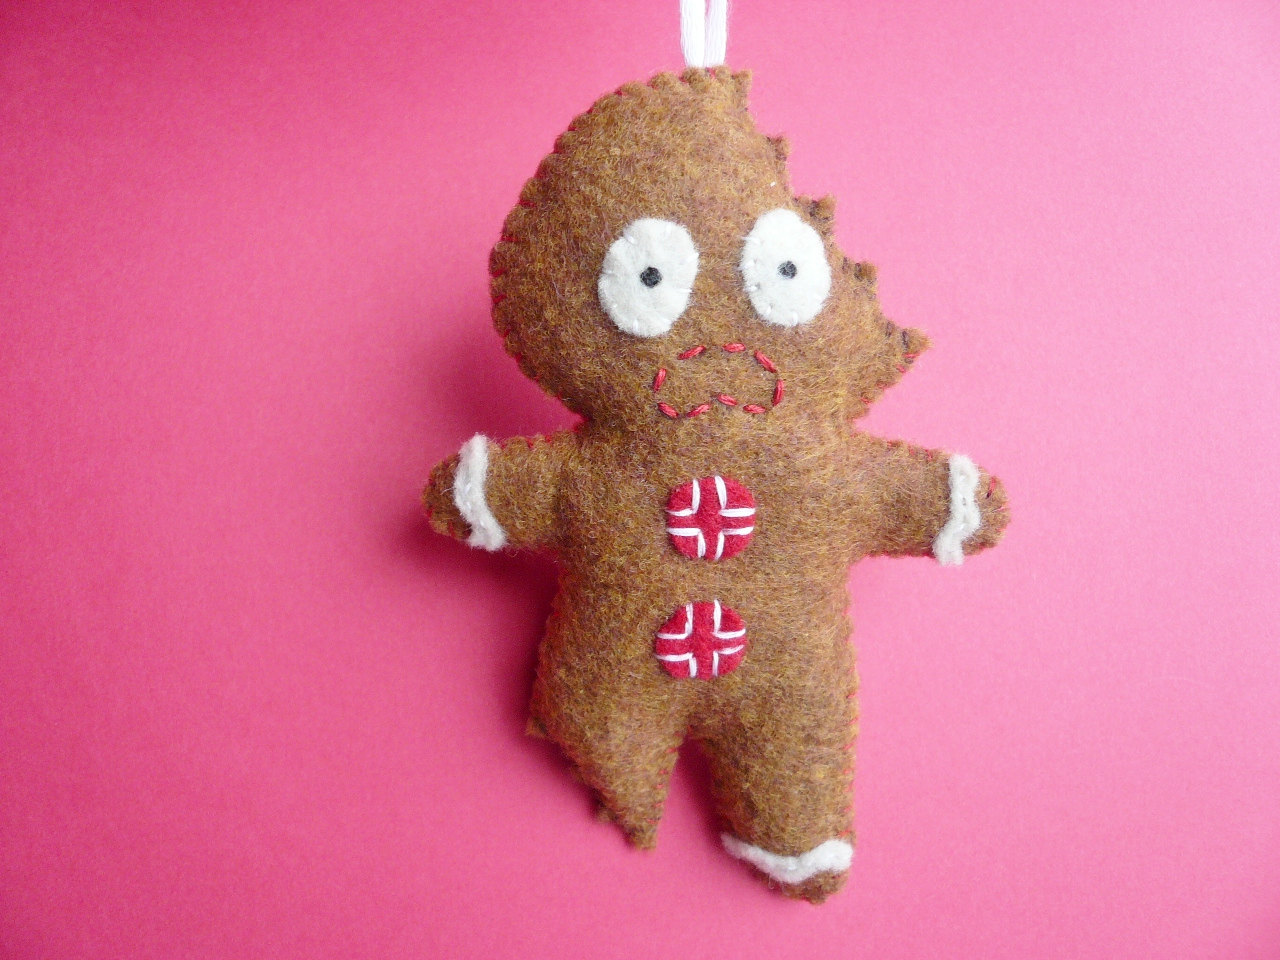 felt christmas ornament terrifed gingerbread man - Felt Christmas Ornaments